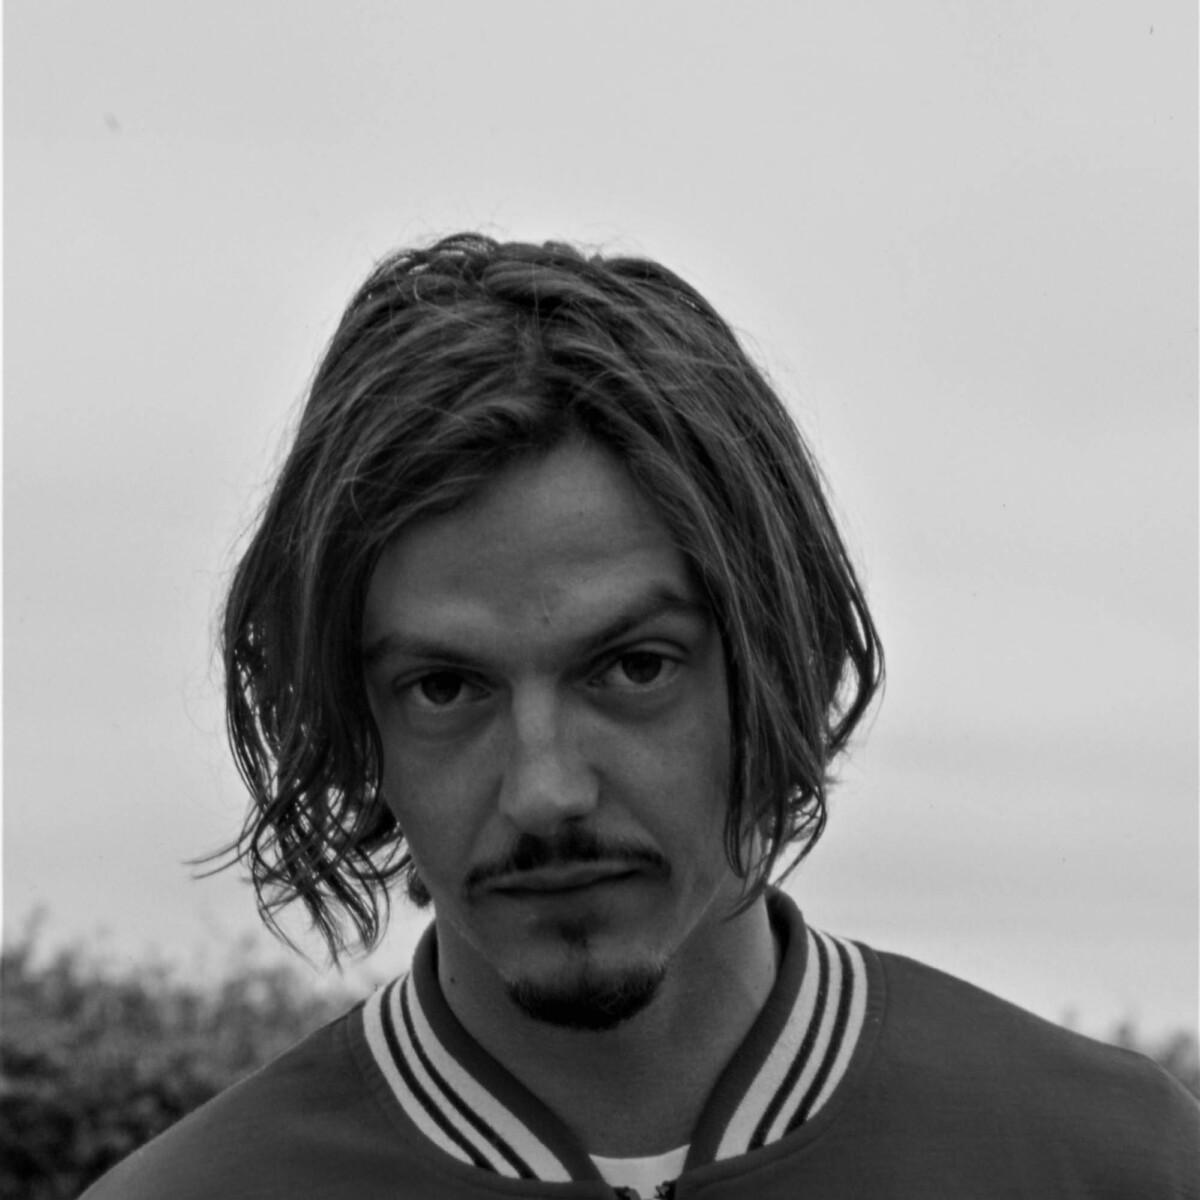 Freddie smith, actor, Dublin